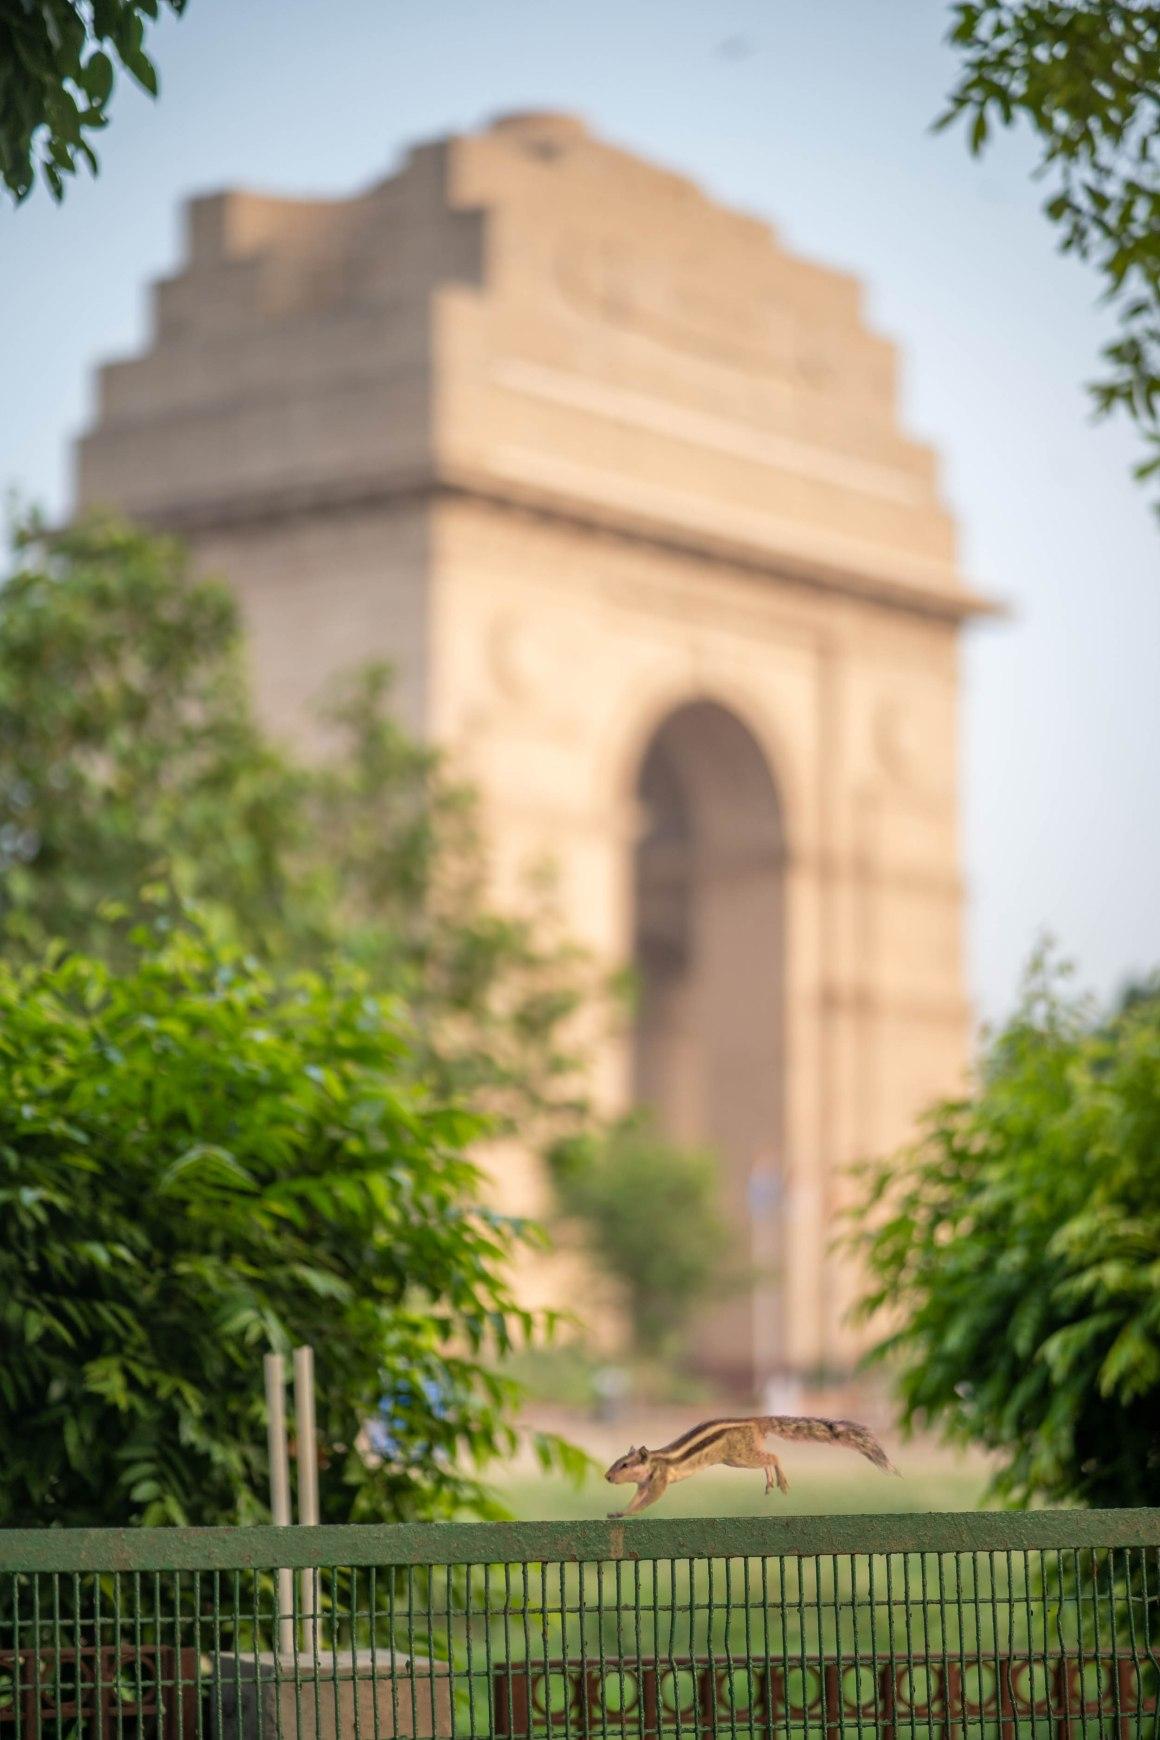 Adobe India, Naina Redhu, World Photography Day, 19th August, Independence Day, 15th August, NAINAxADOBE, AdobeLife, Rashtrapati Bhavan, India Gate, PhotoWalk, Delhi PhotoWalk, India Gate Photo Walk, Rashtrapati Bhavan PhotoWalk, India PhotoWalk, Professional PhotoWalk, Photo Walk, New Delhi, Monumentally Speaking, Monuments, Delhi Heritage, India Heritage, Heritage PhotoWalk, Naina.co, Professional Photographer, Influencer, Landscape Photography, Professional Photography, Photo Blogger, Professional Blogger